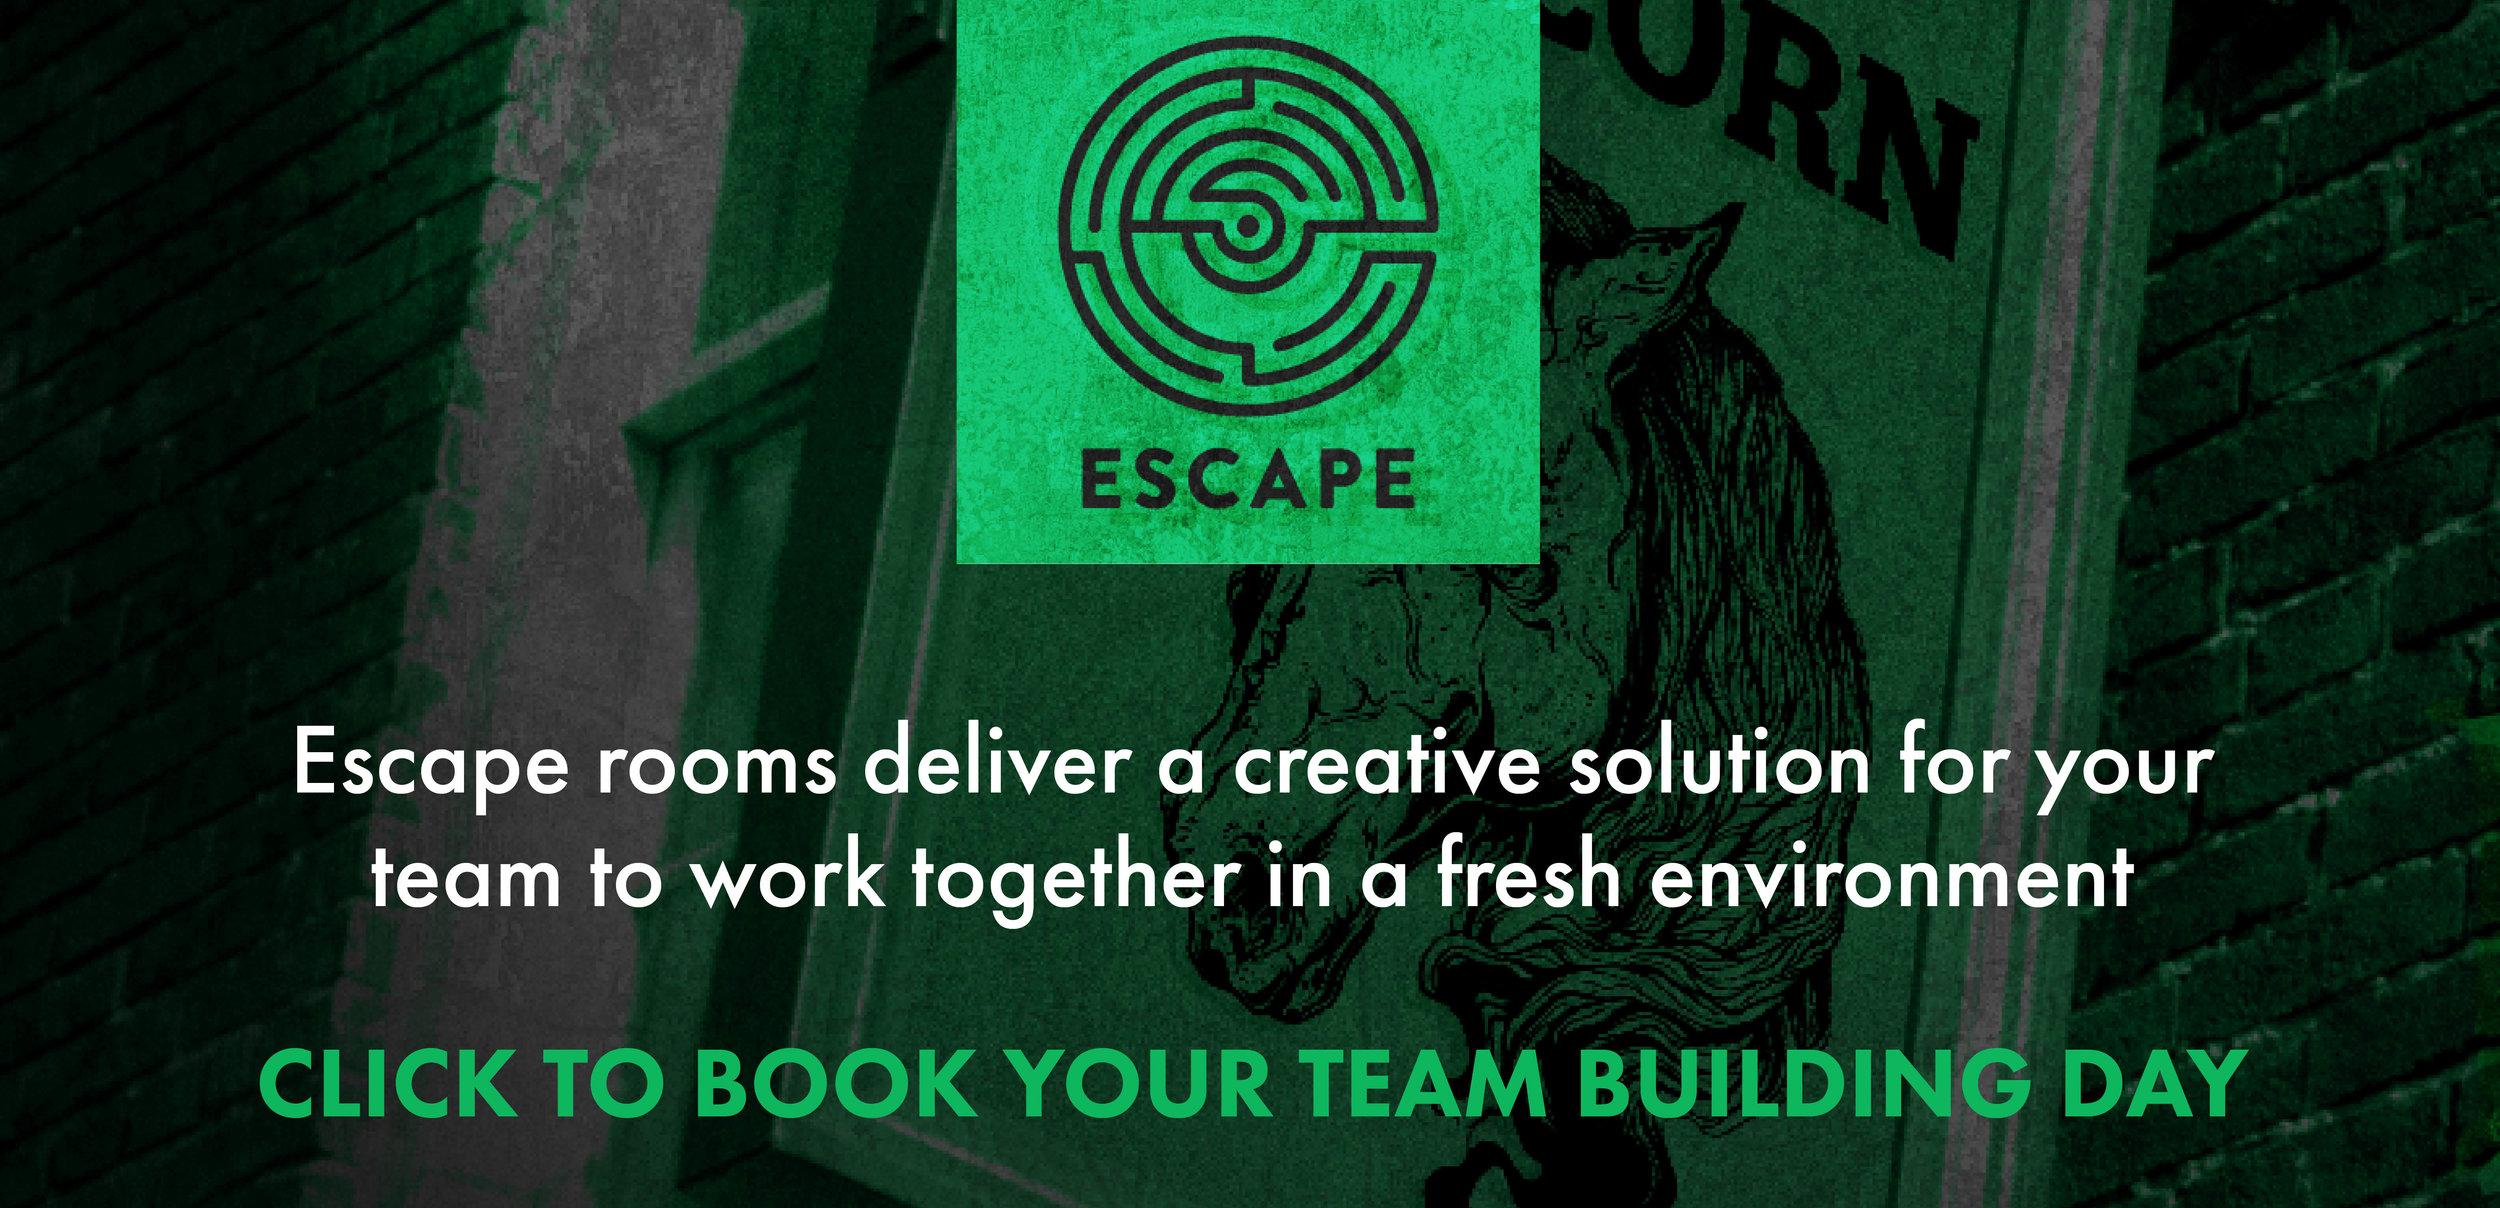 Escape Advert 22.jpg